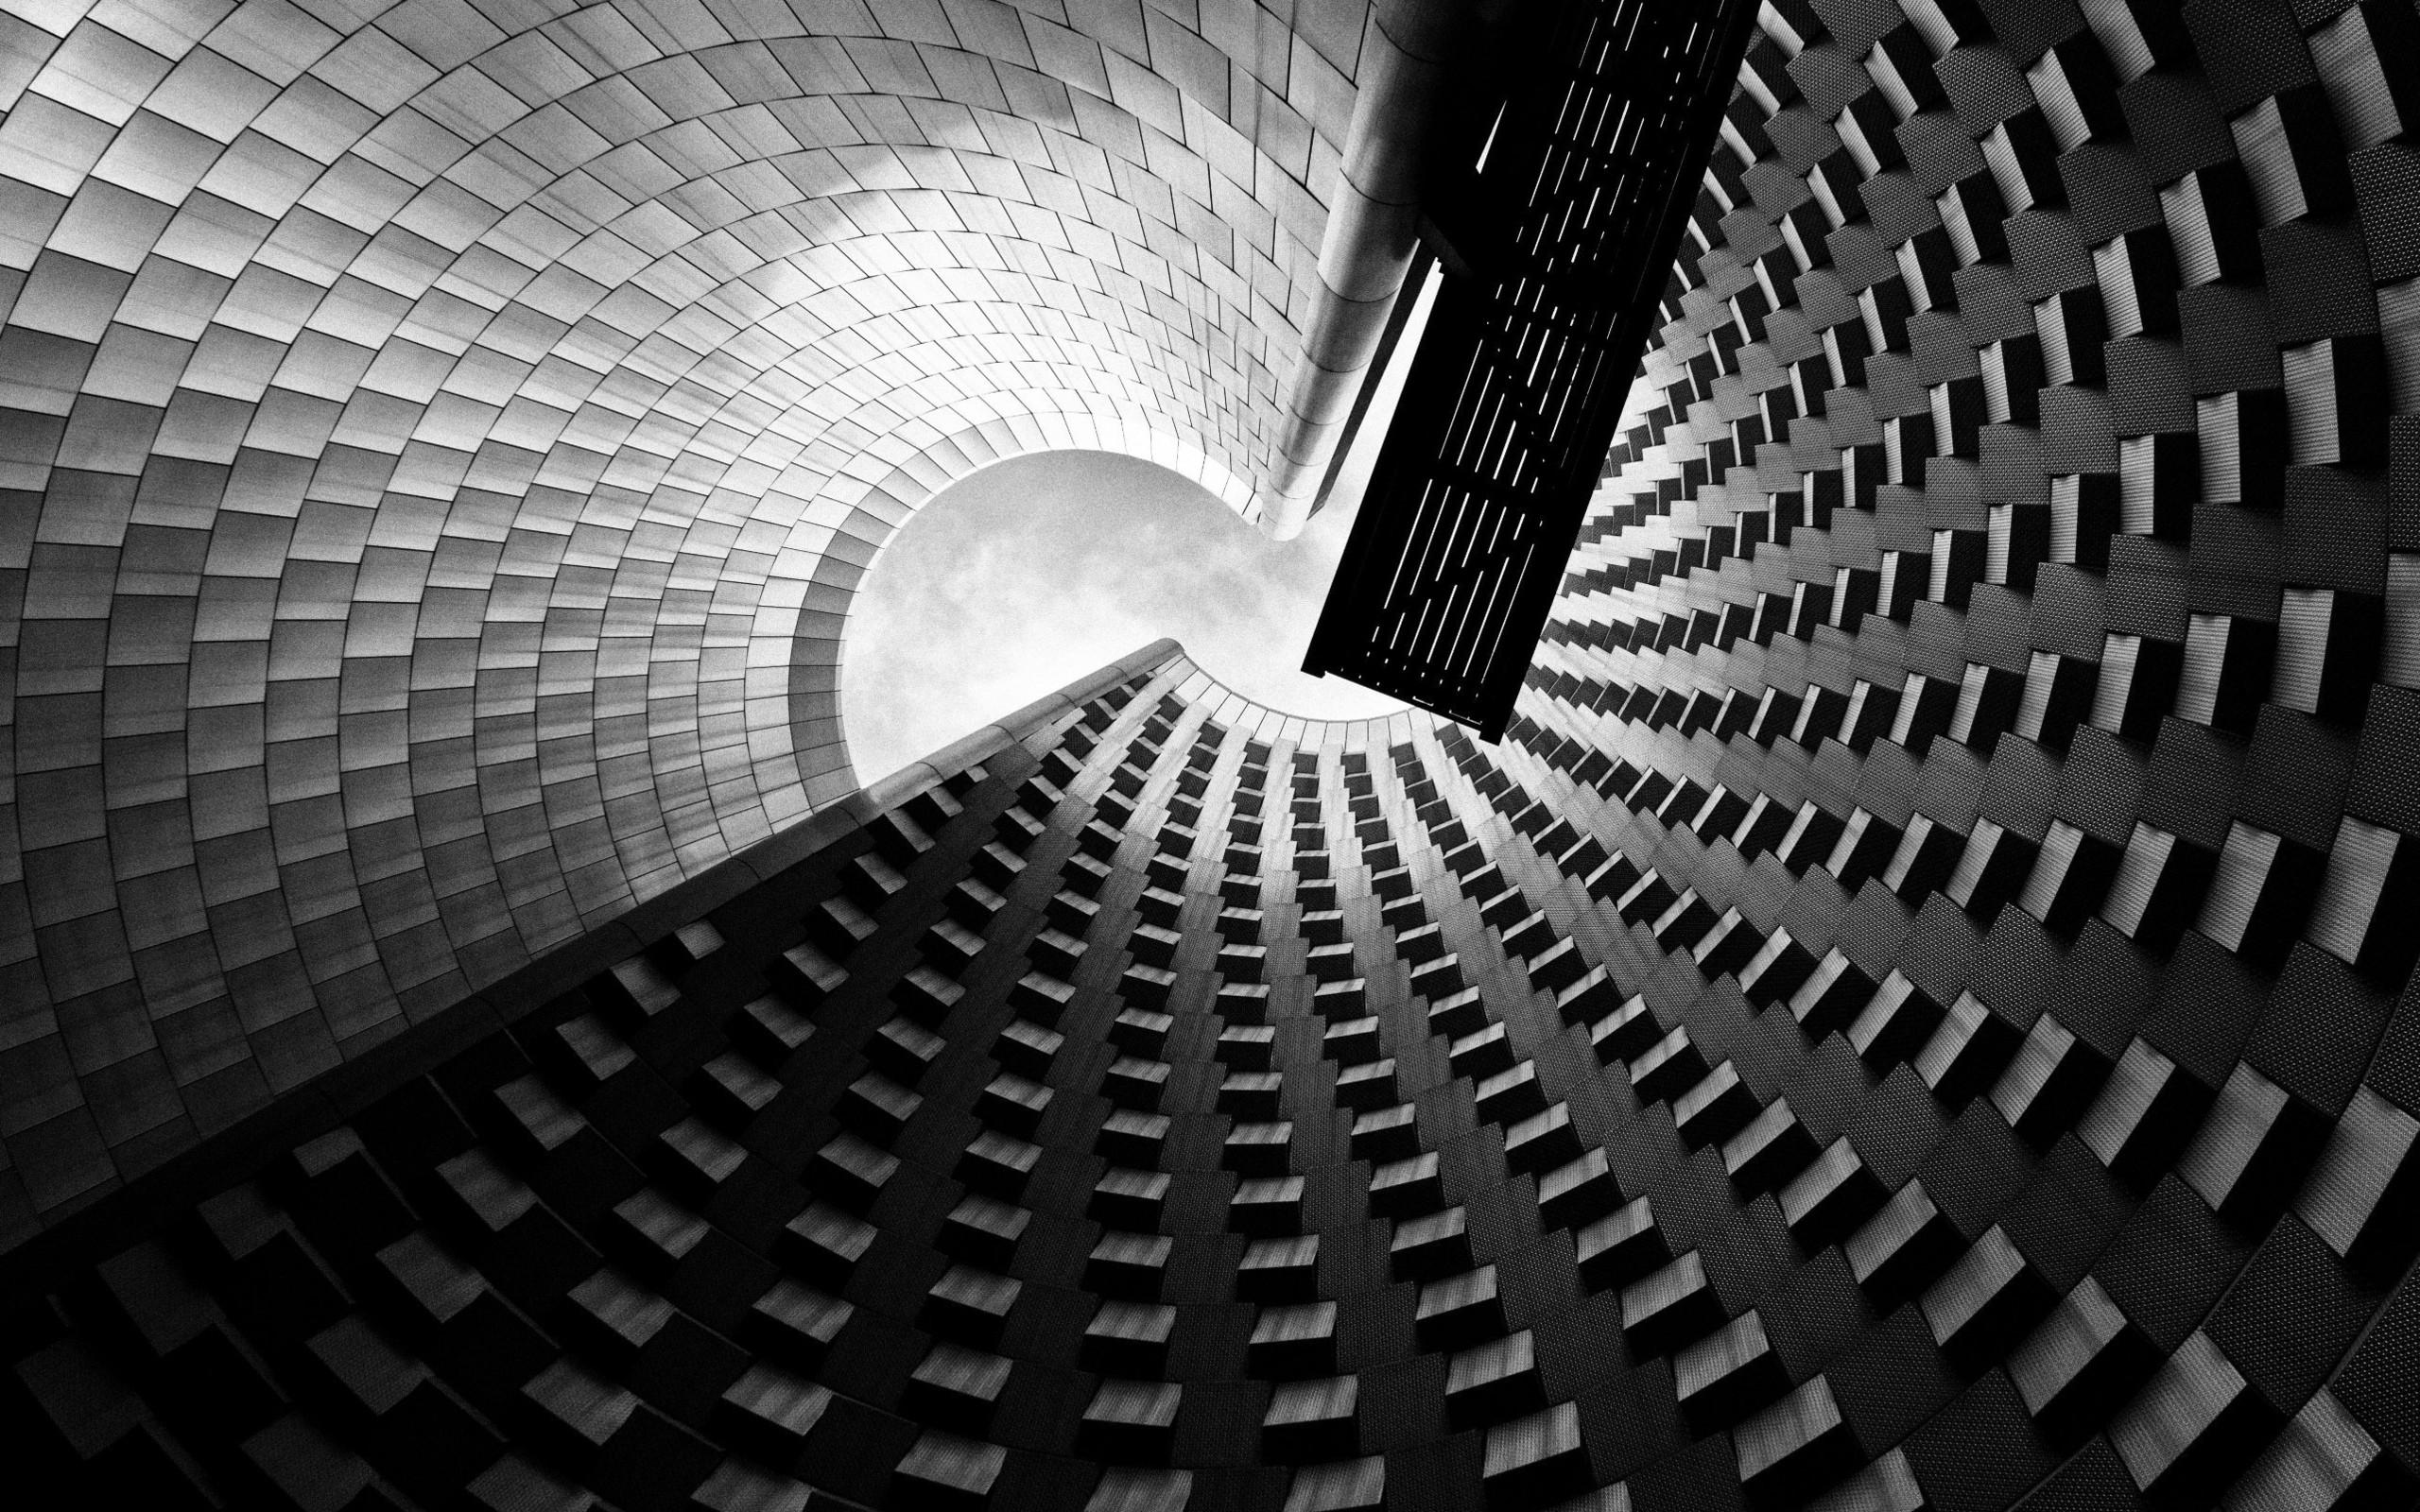 Skyscraper Wallpaper Hd Wallpaper Architecture Wall Artwork Clouds Spiral